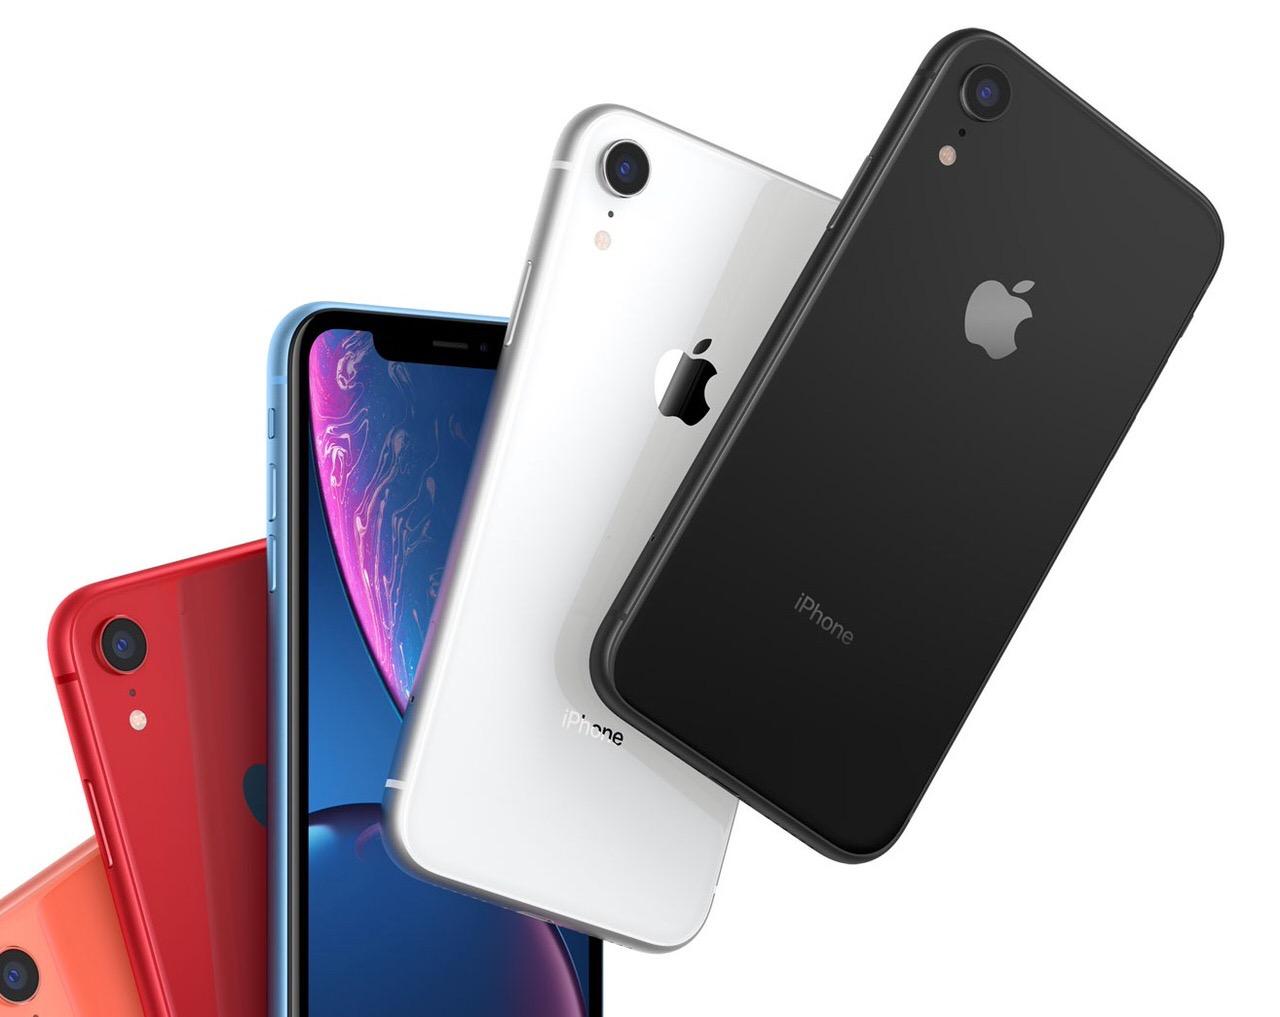 iPhone発売日は9月20日か?ソフトバンク宮内社長がうっかり漏らす